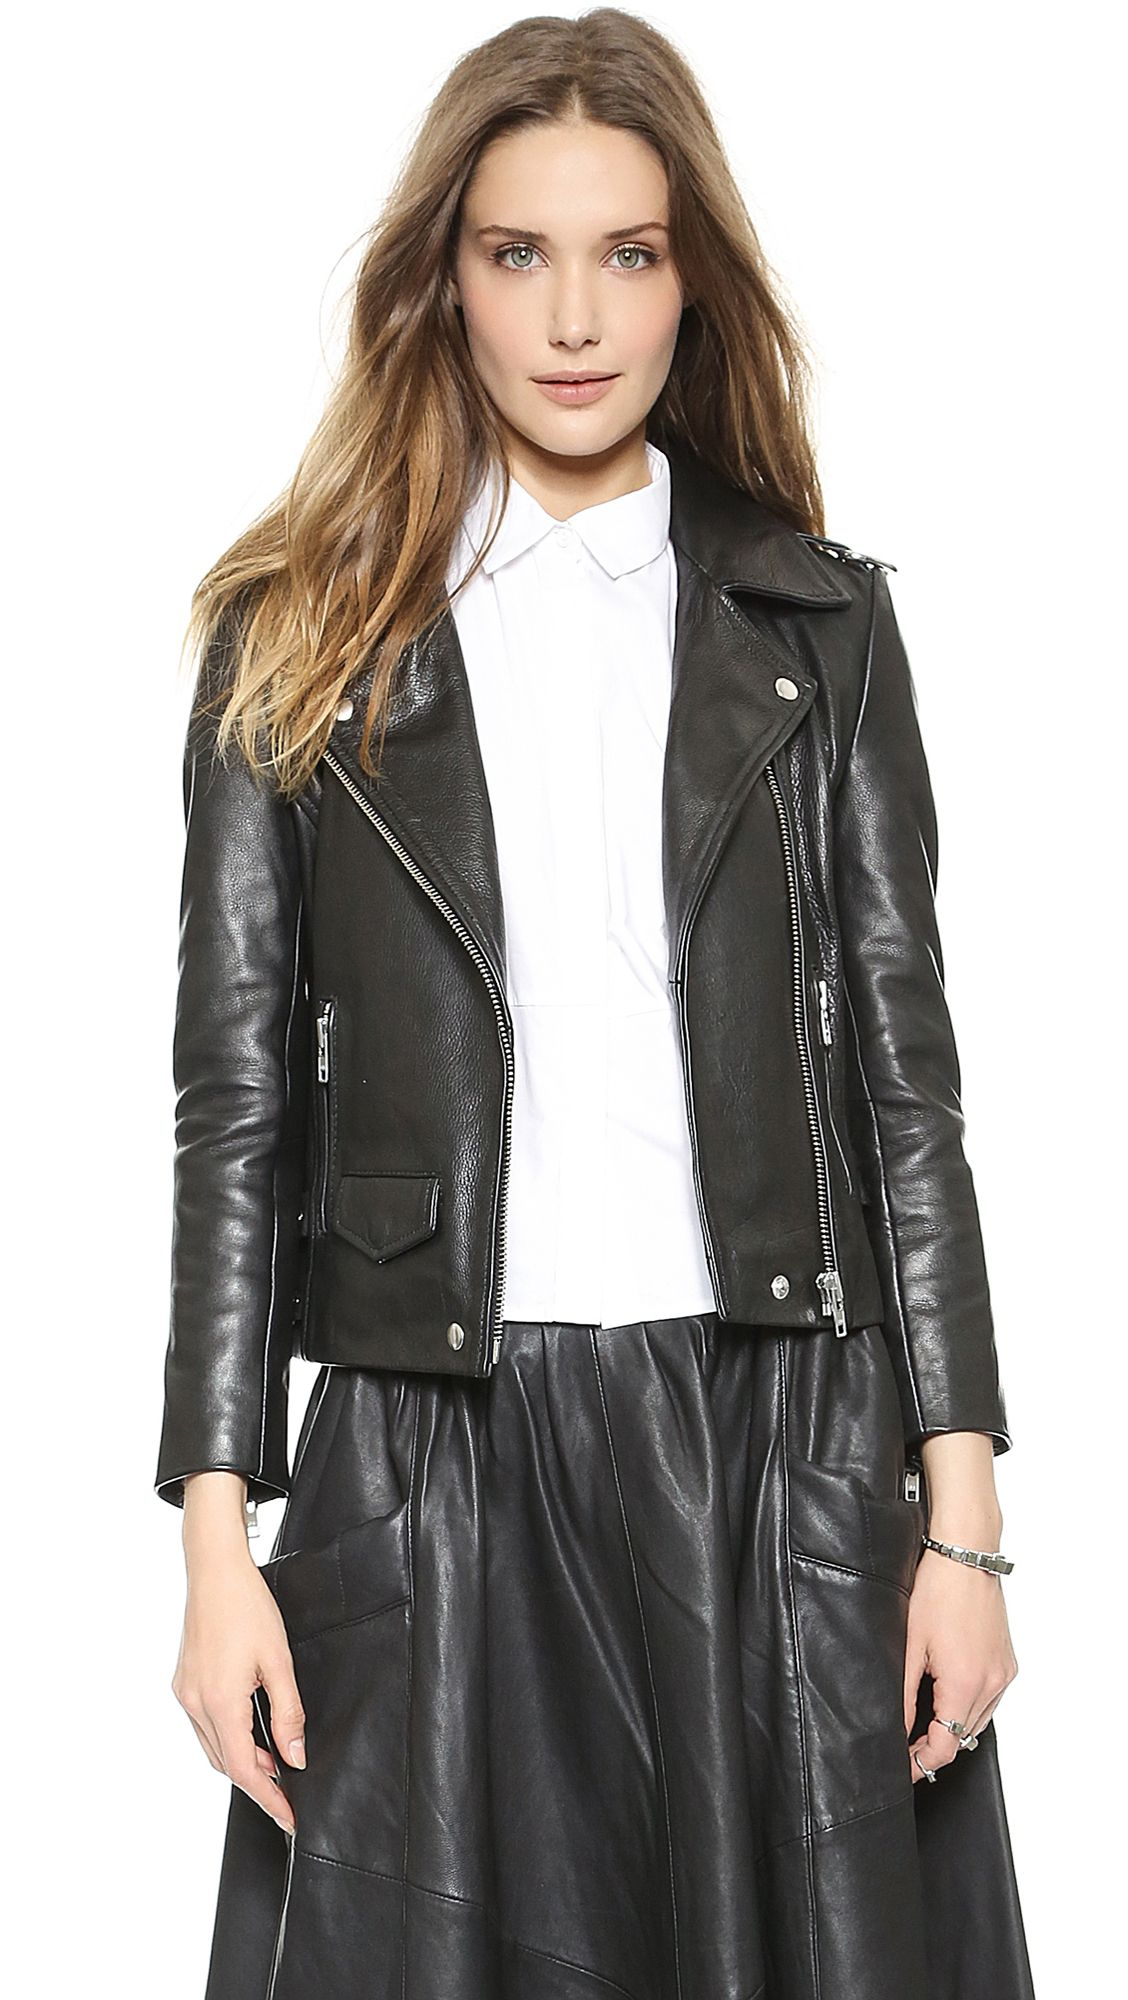 Buy OAK Women's Rider Leather Jacket Black, starting at